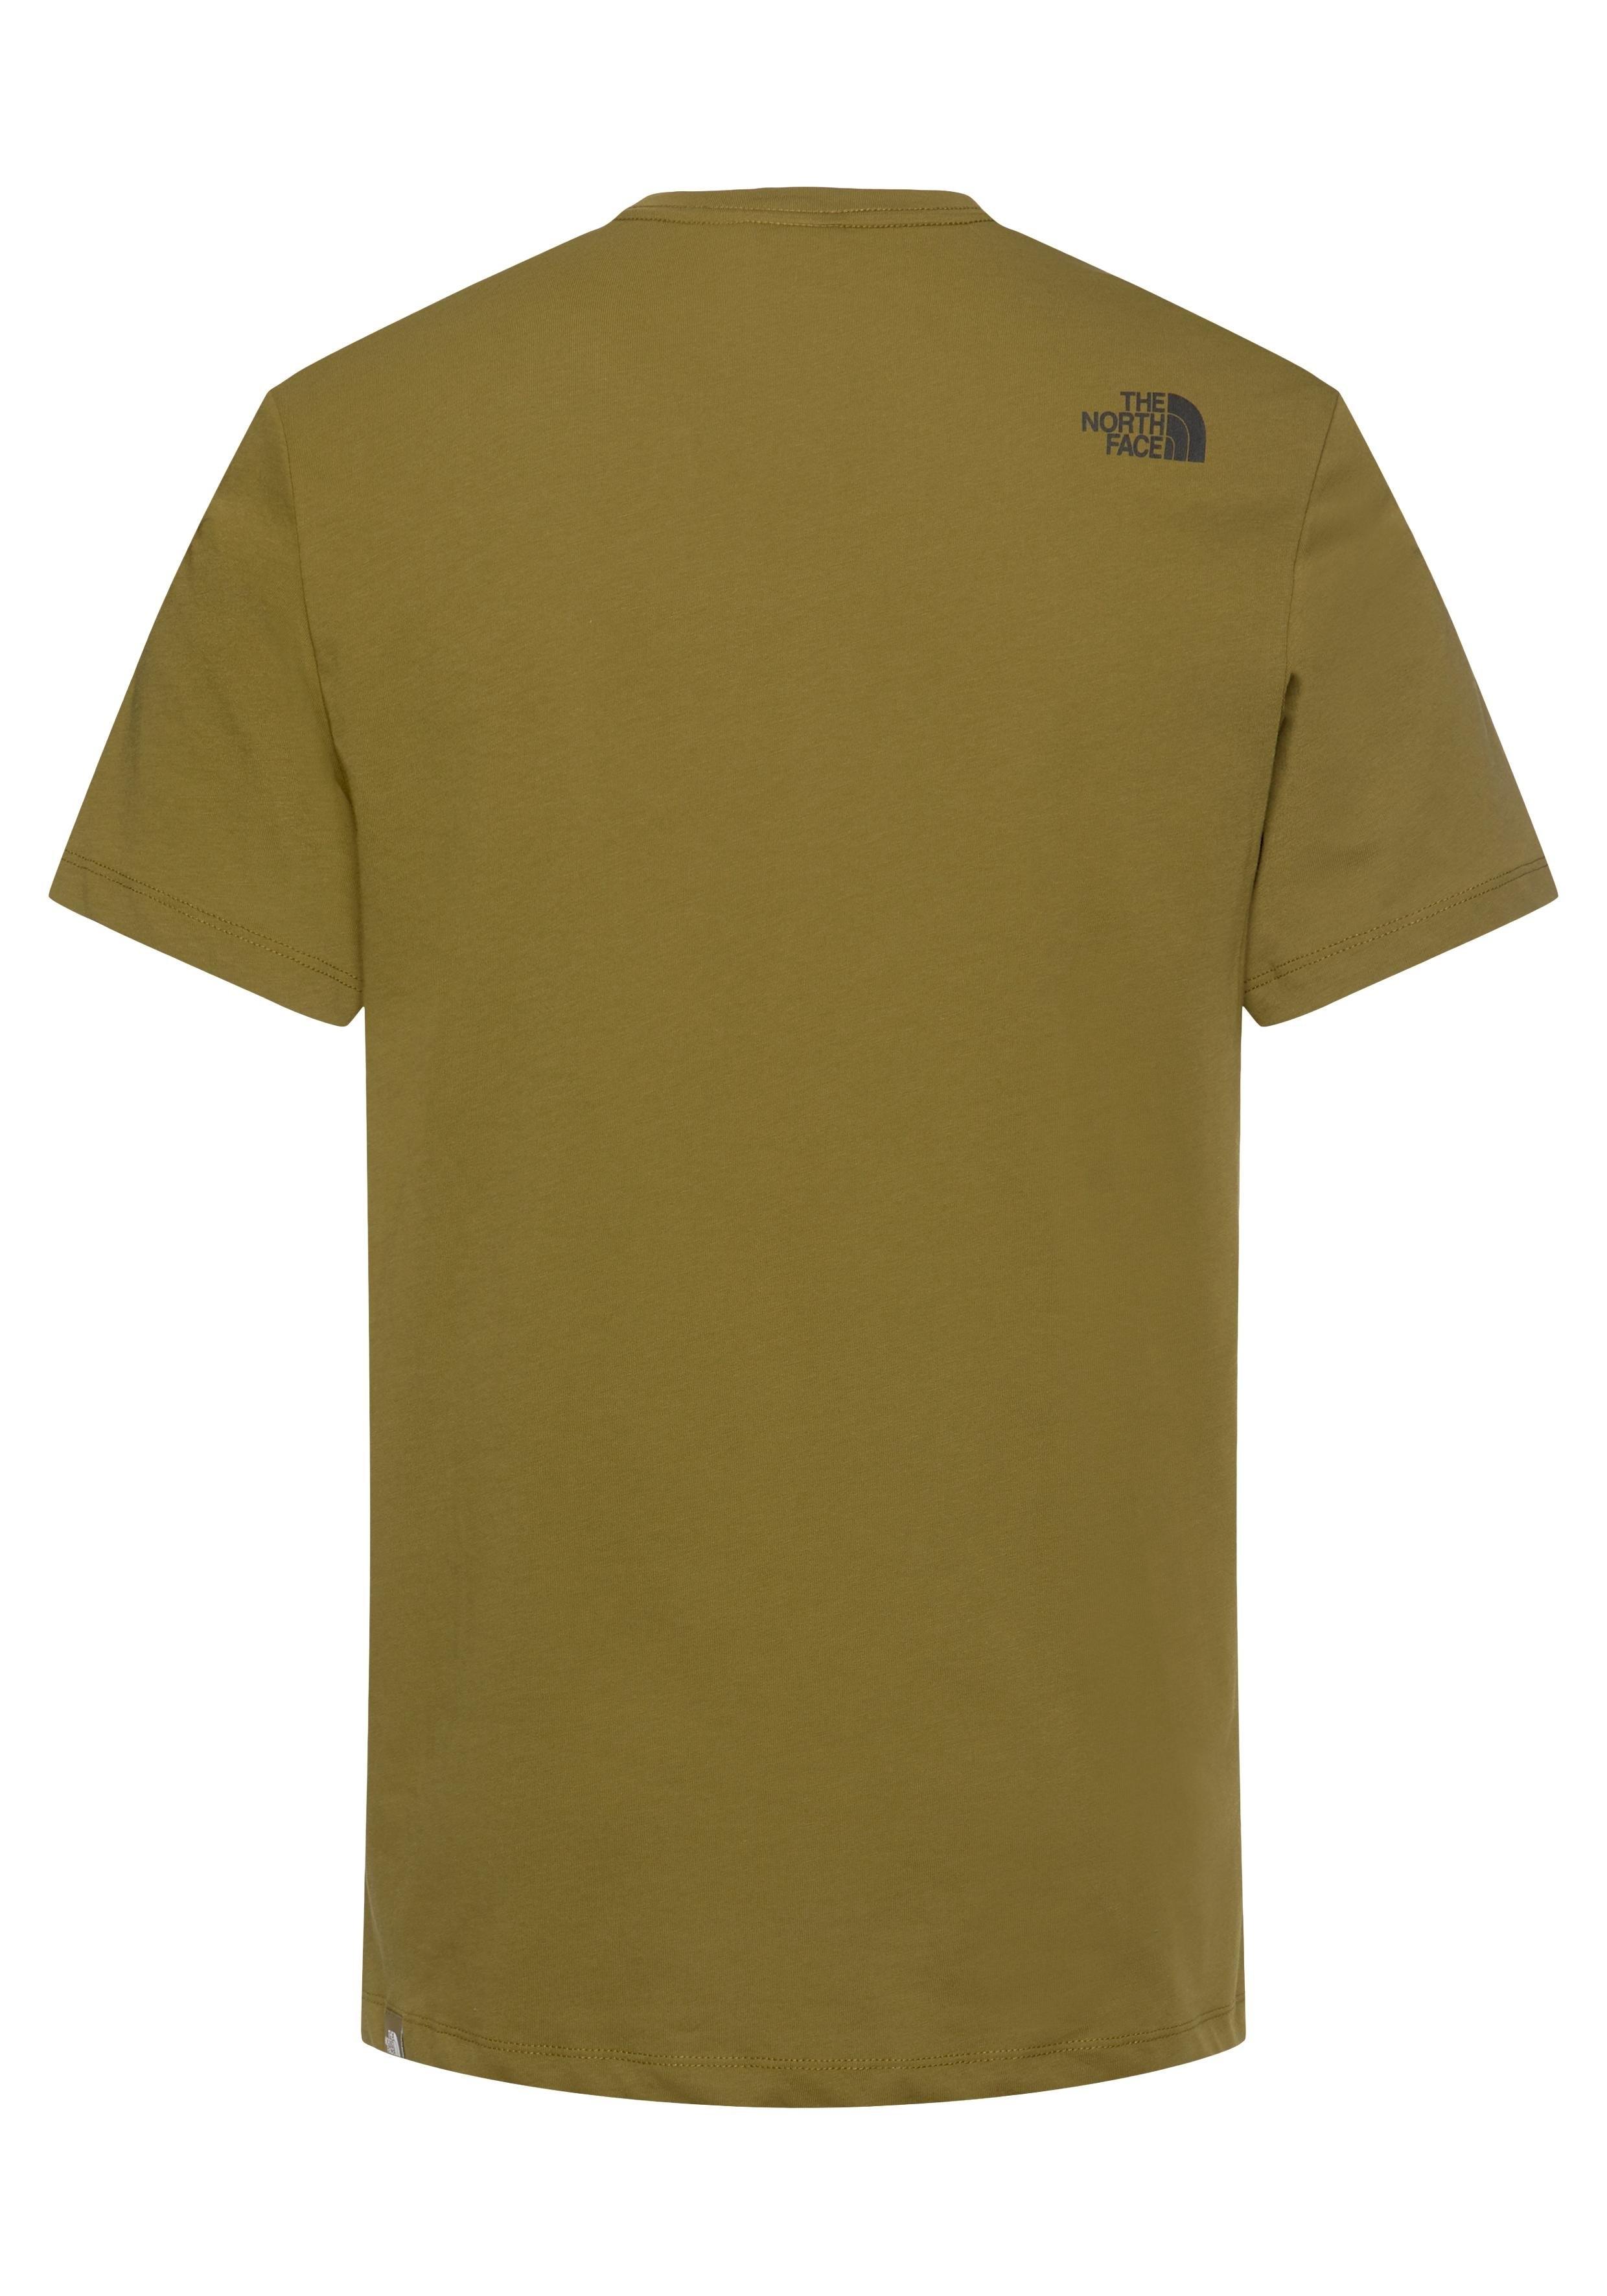 The North Face T-shirt - verschillende betaalmethodes